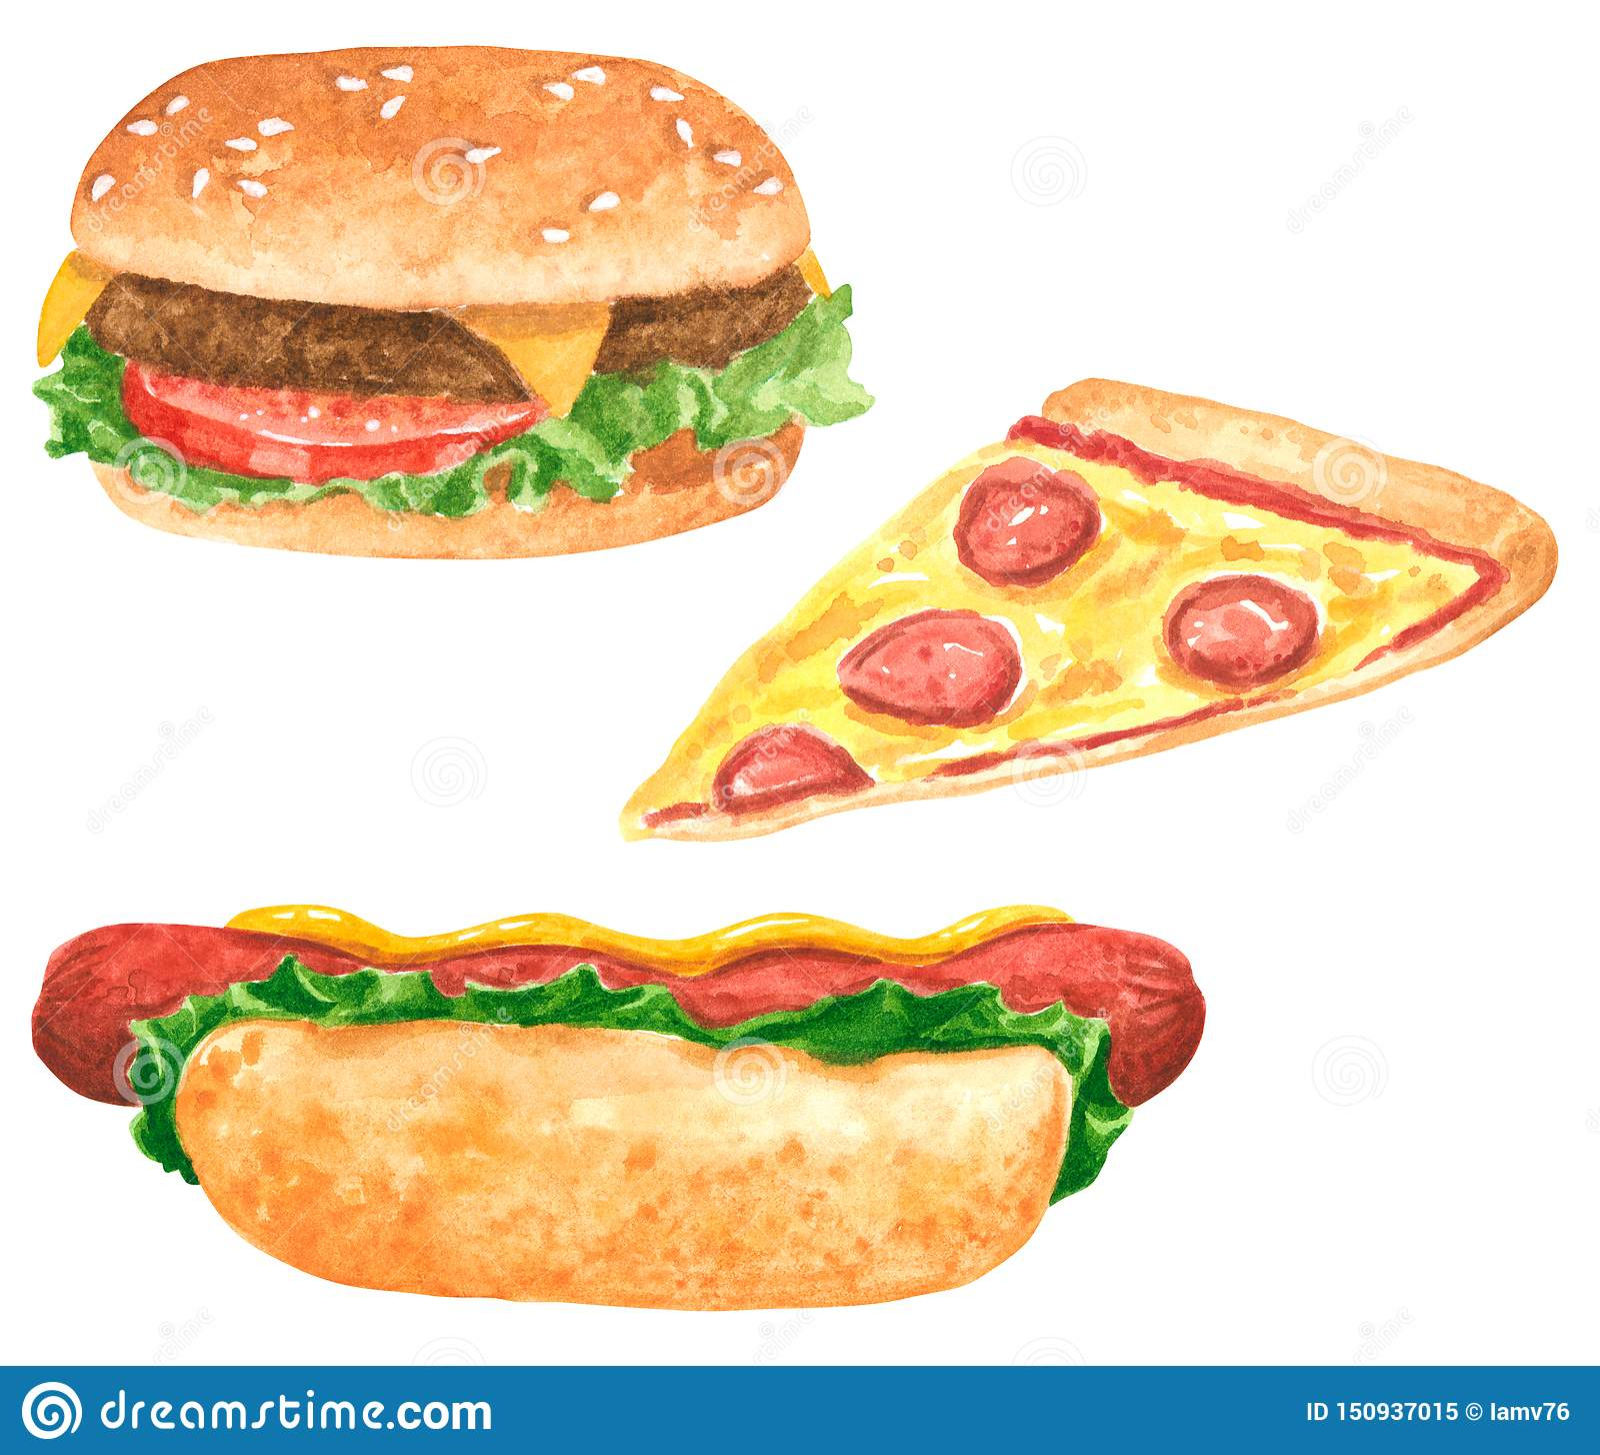 Hot dog, Hamburger Fast food clipart - Hot Dog png herunterladen -  2400*1471 - Kostenlos transparent Outdoor Schuh png Herunterladen.